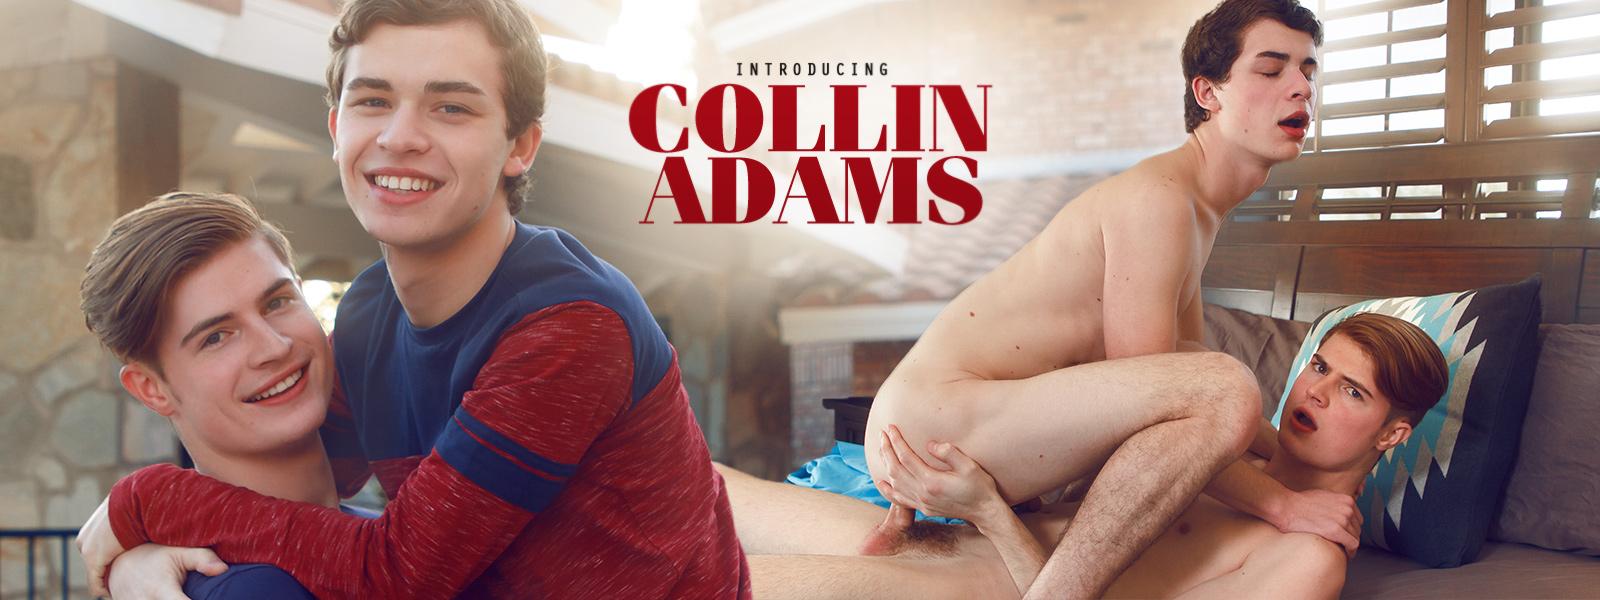 Introducing Collin Adams